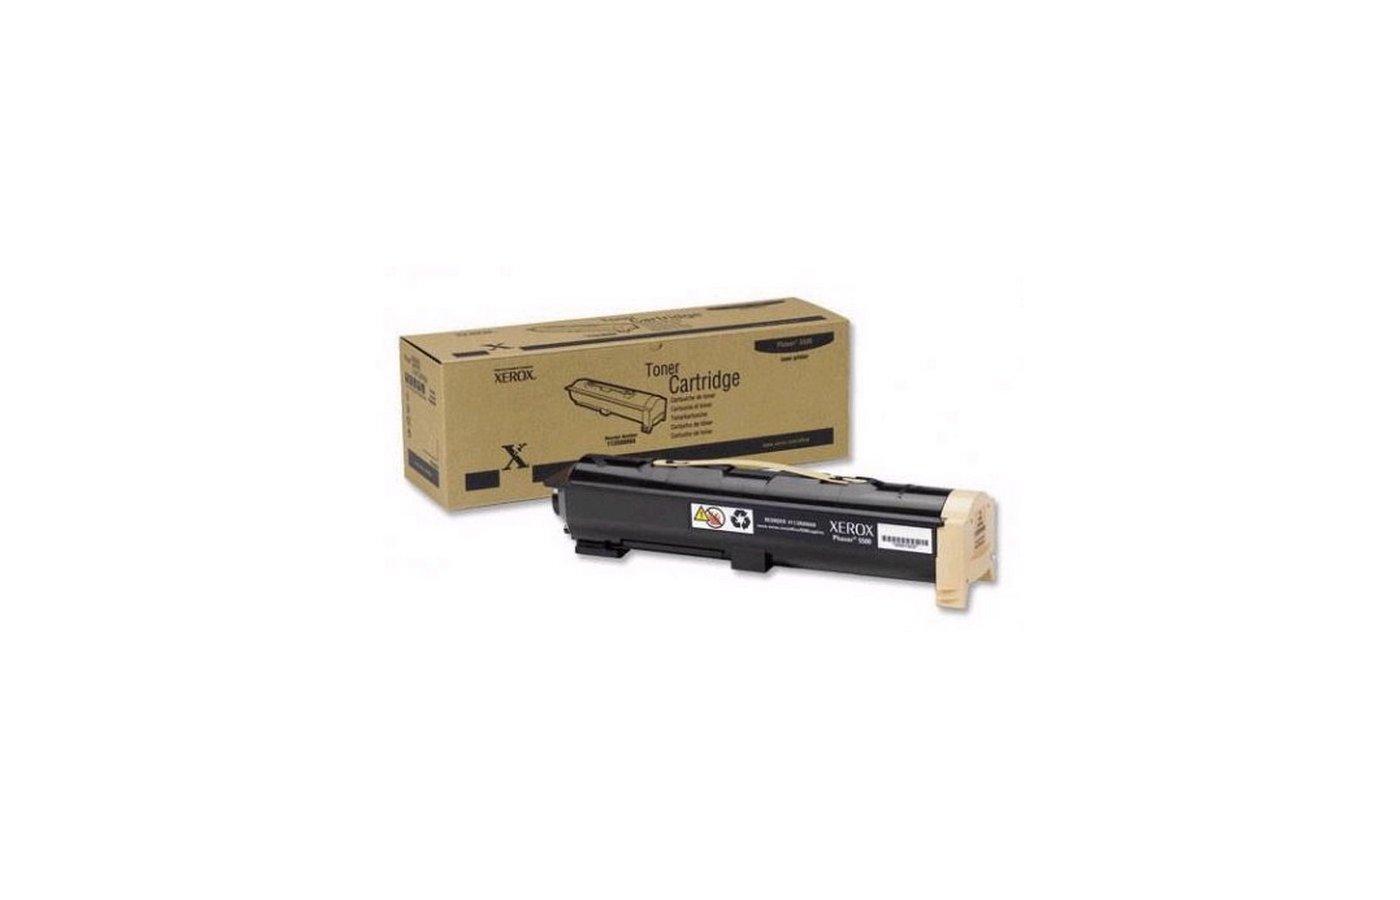 Картридж лазерный Xerox 006R01319 черный для Xerox WC 7132/7232/7242 (24000стр.)